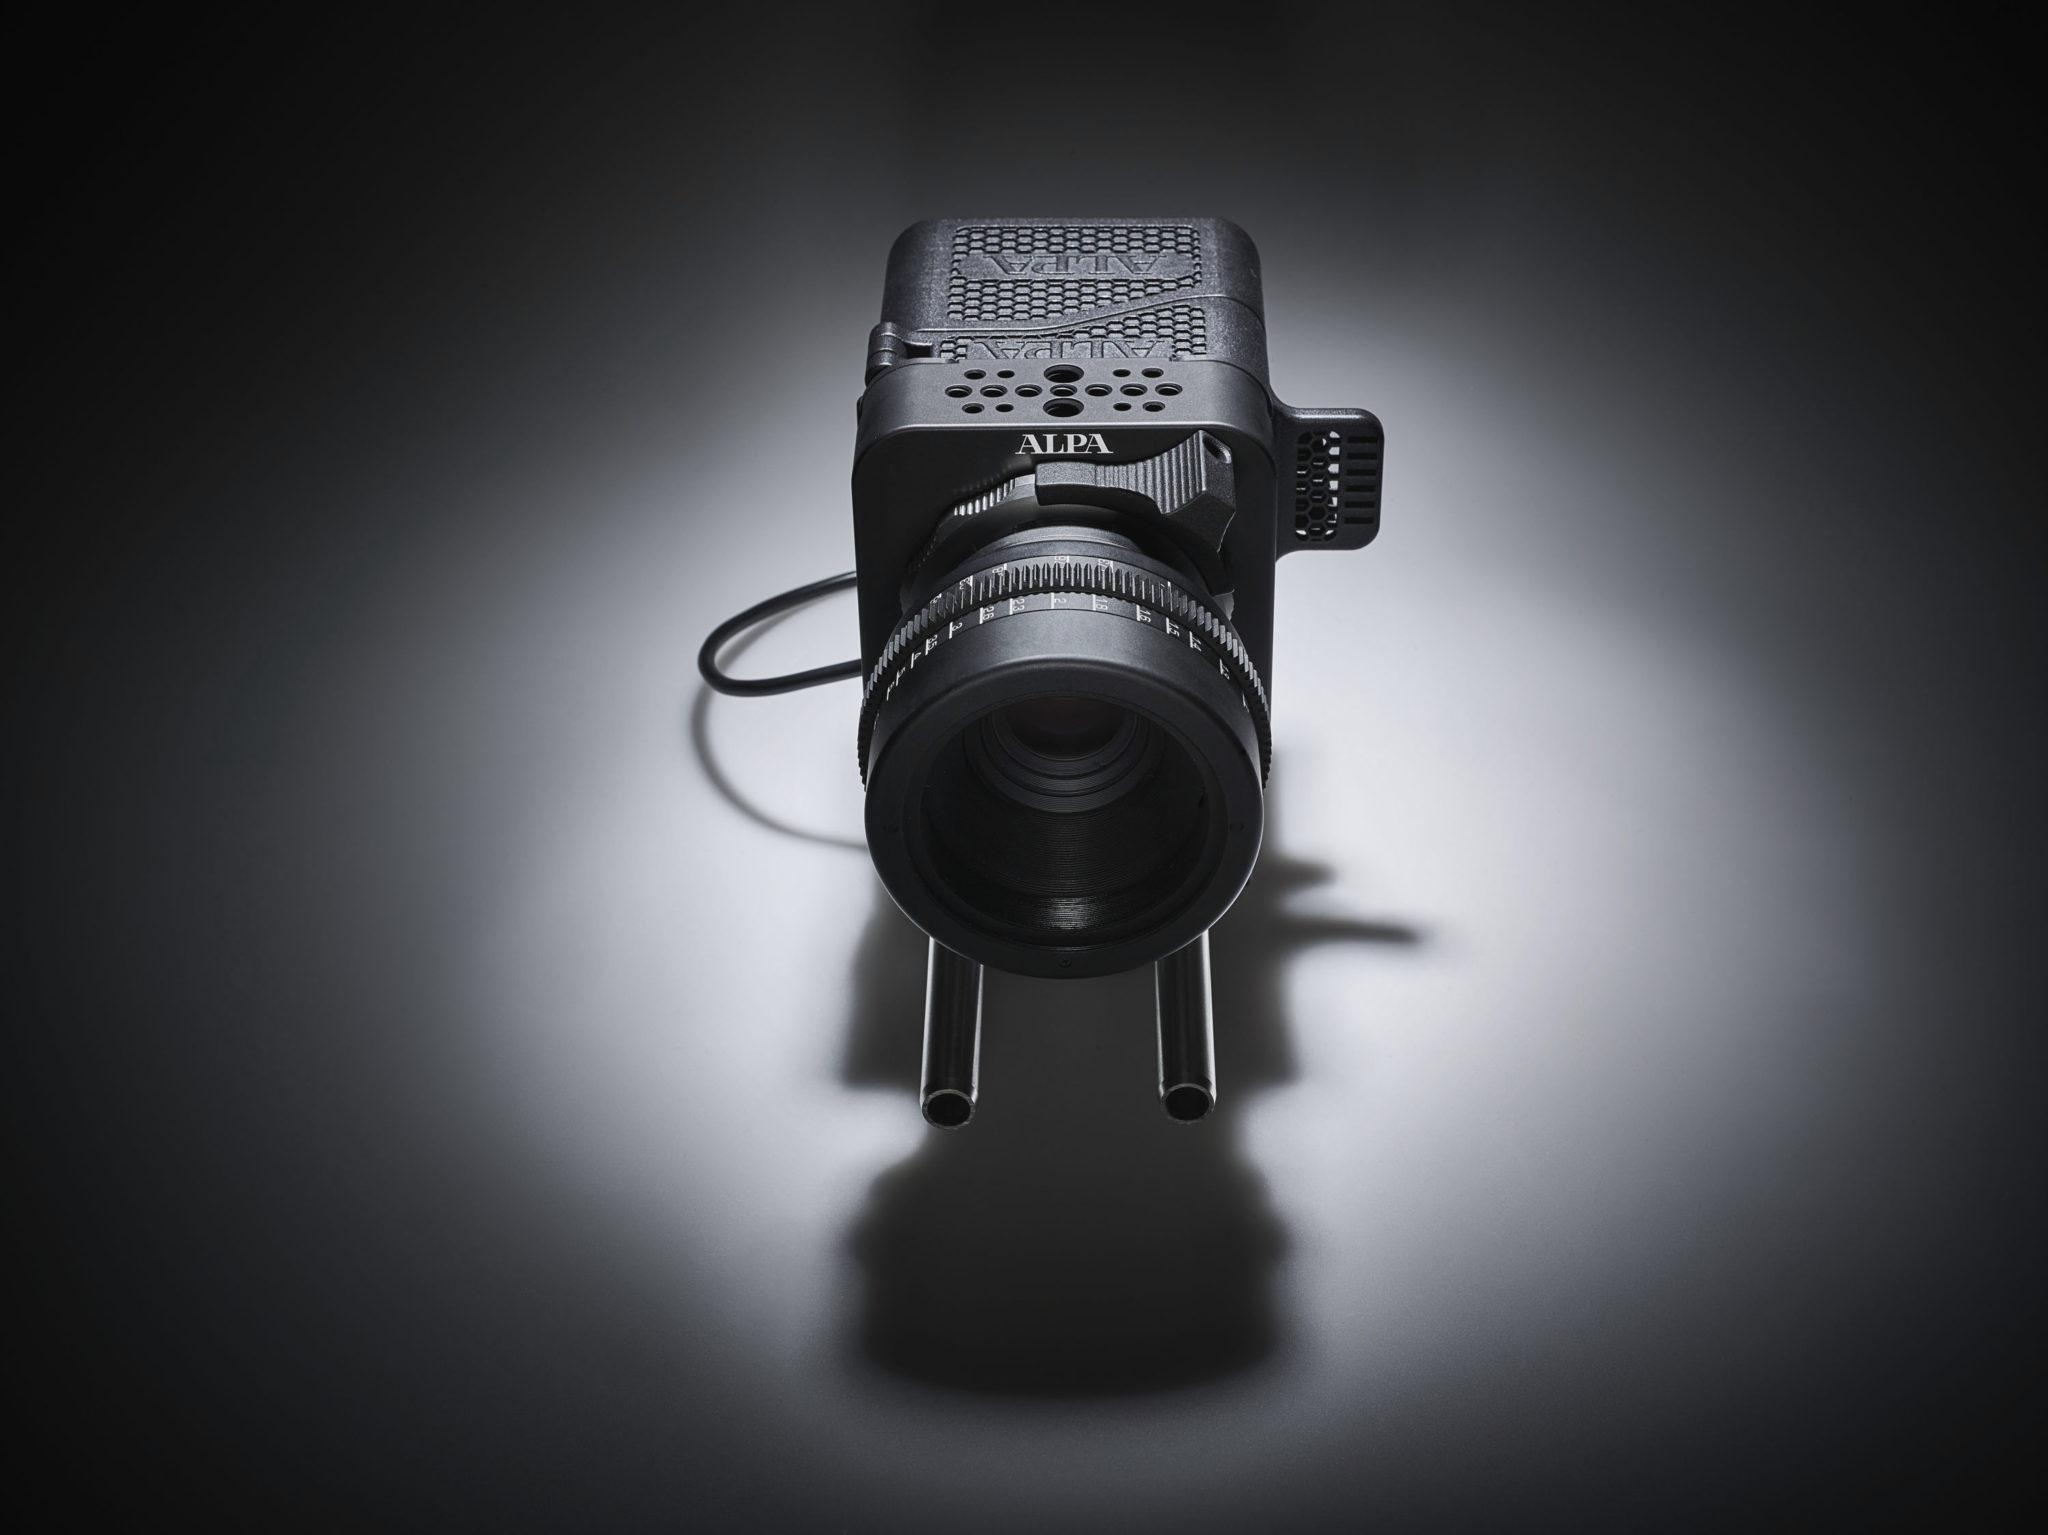 ALPA Makes Moves Aimed At Medium Format Video Shooters